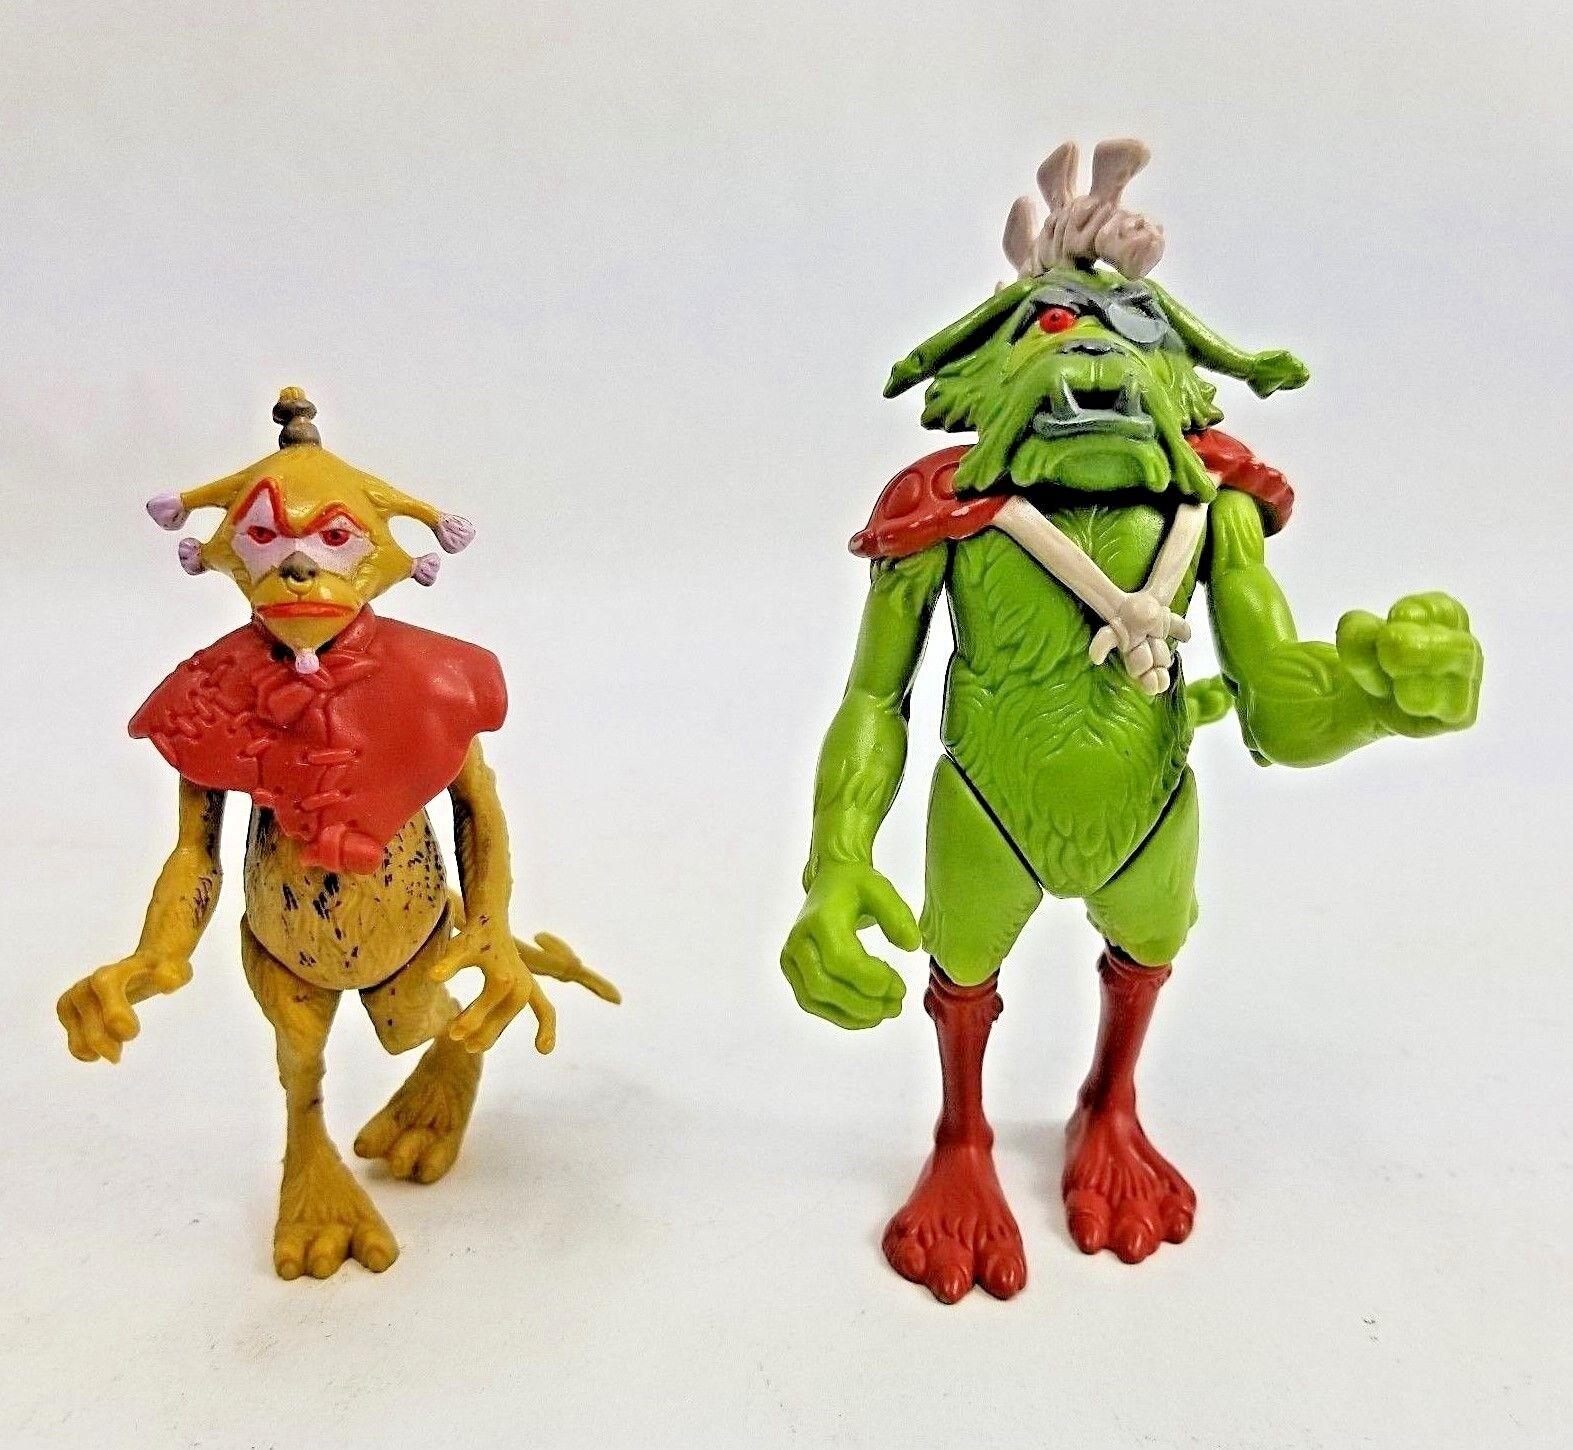 Urgah Lady gorneesh y Rey gorneesh 1985 figuras de serie cómica Ewoks